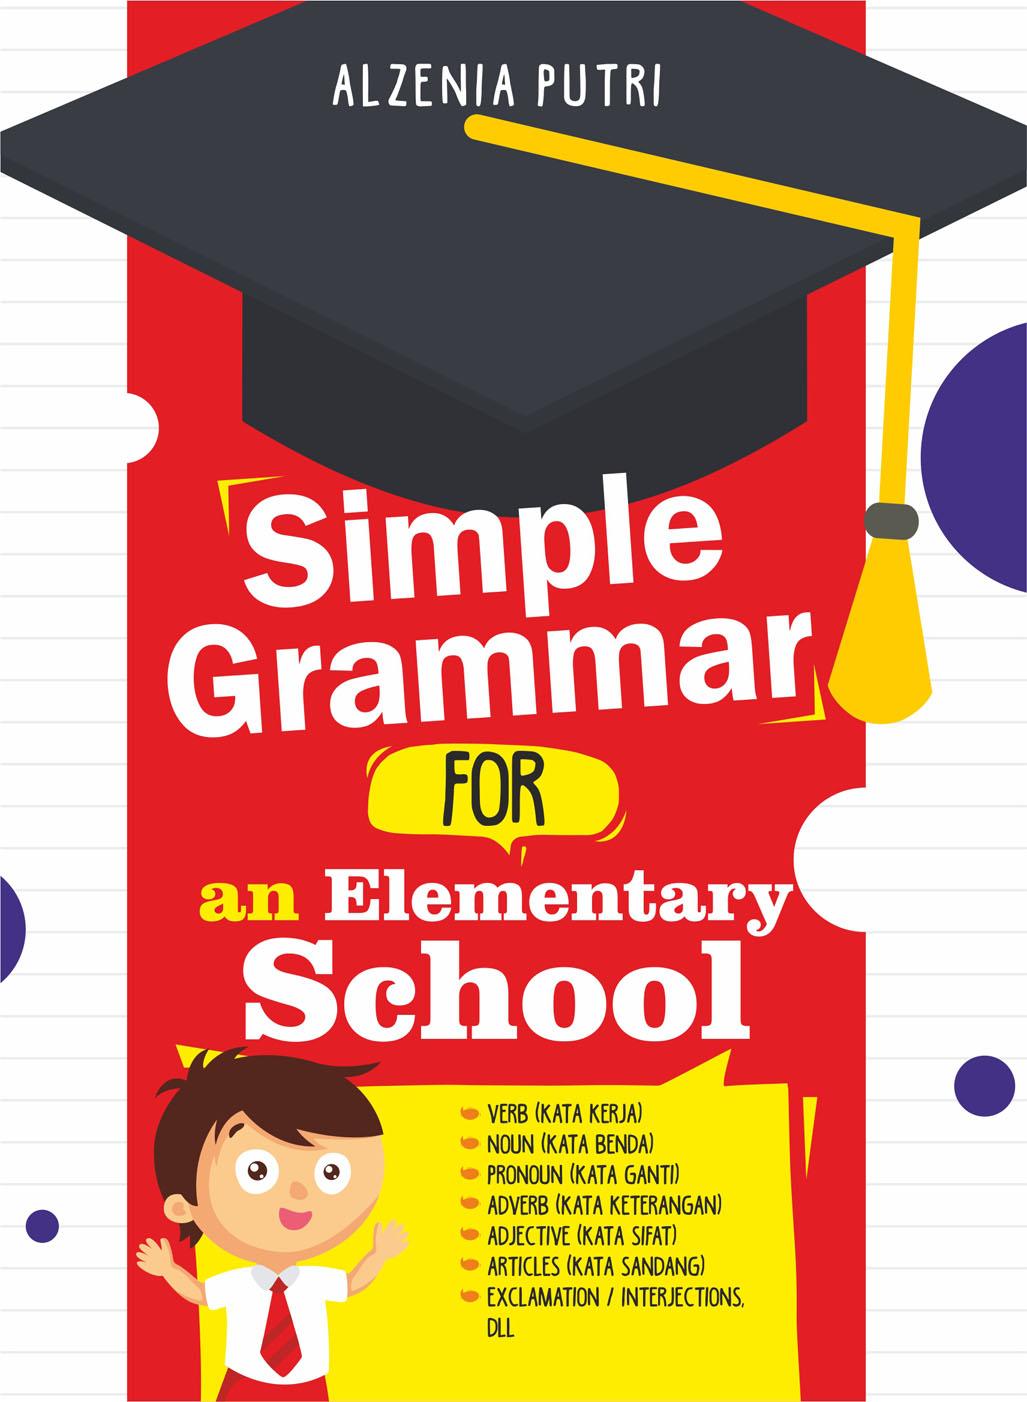 SIMPLE GRAMMAR FOR AN ELEMNTARY SCHOOLen